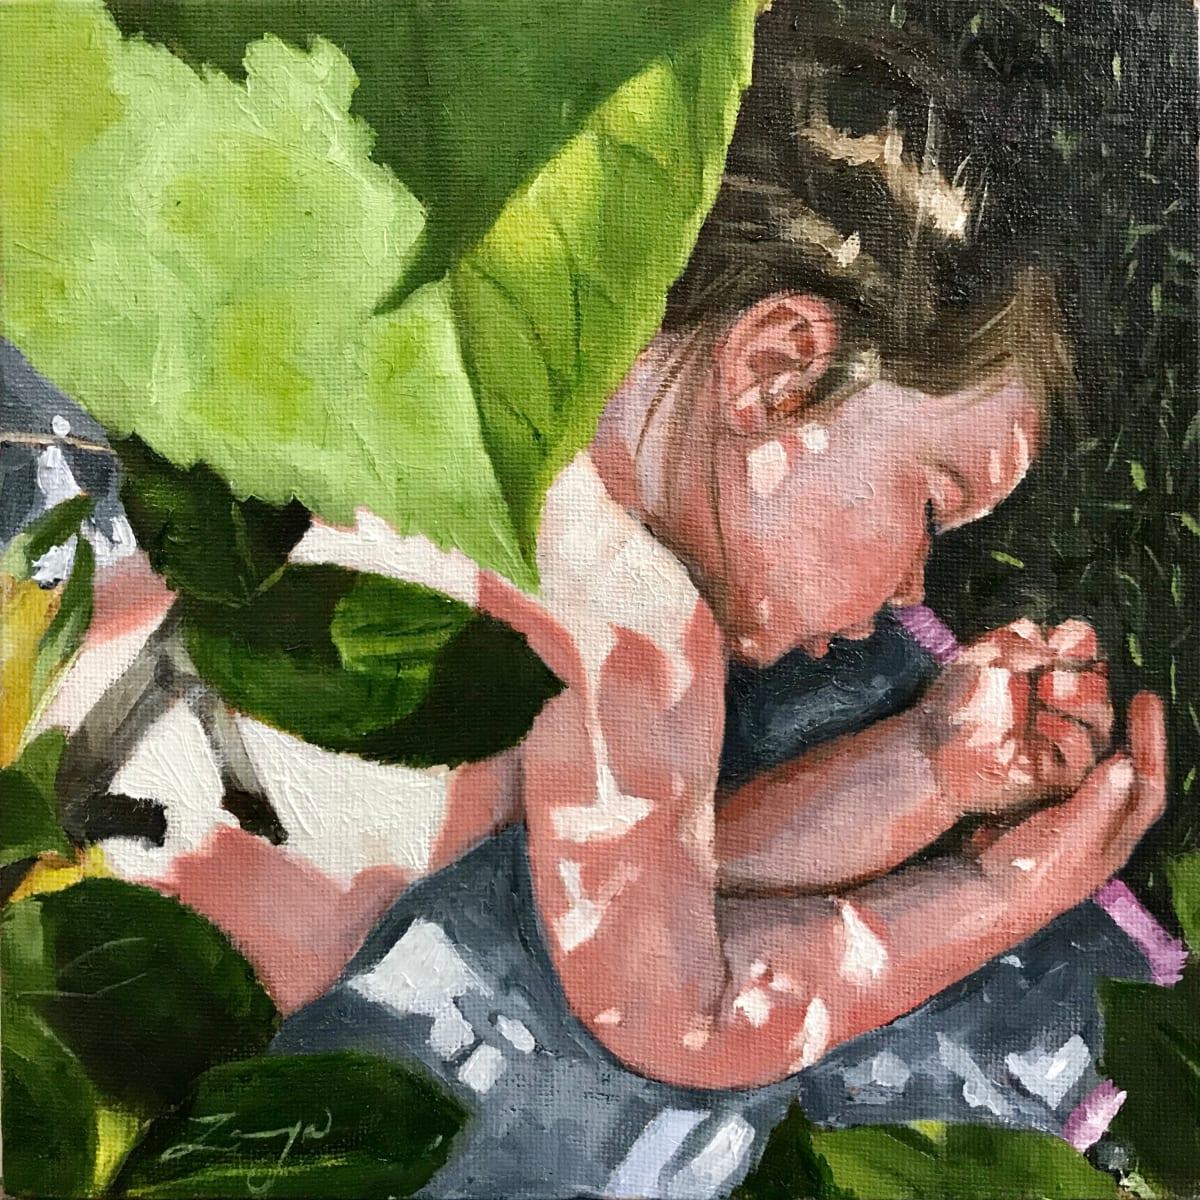 Midday Nap Under the Apple Tree by Zanya Dahl